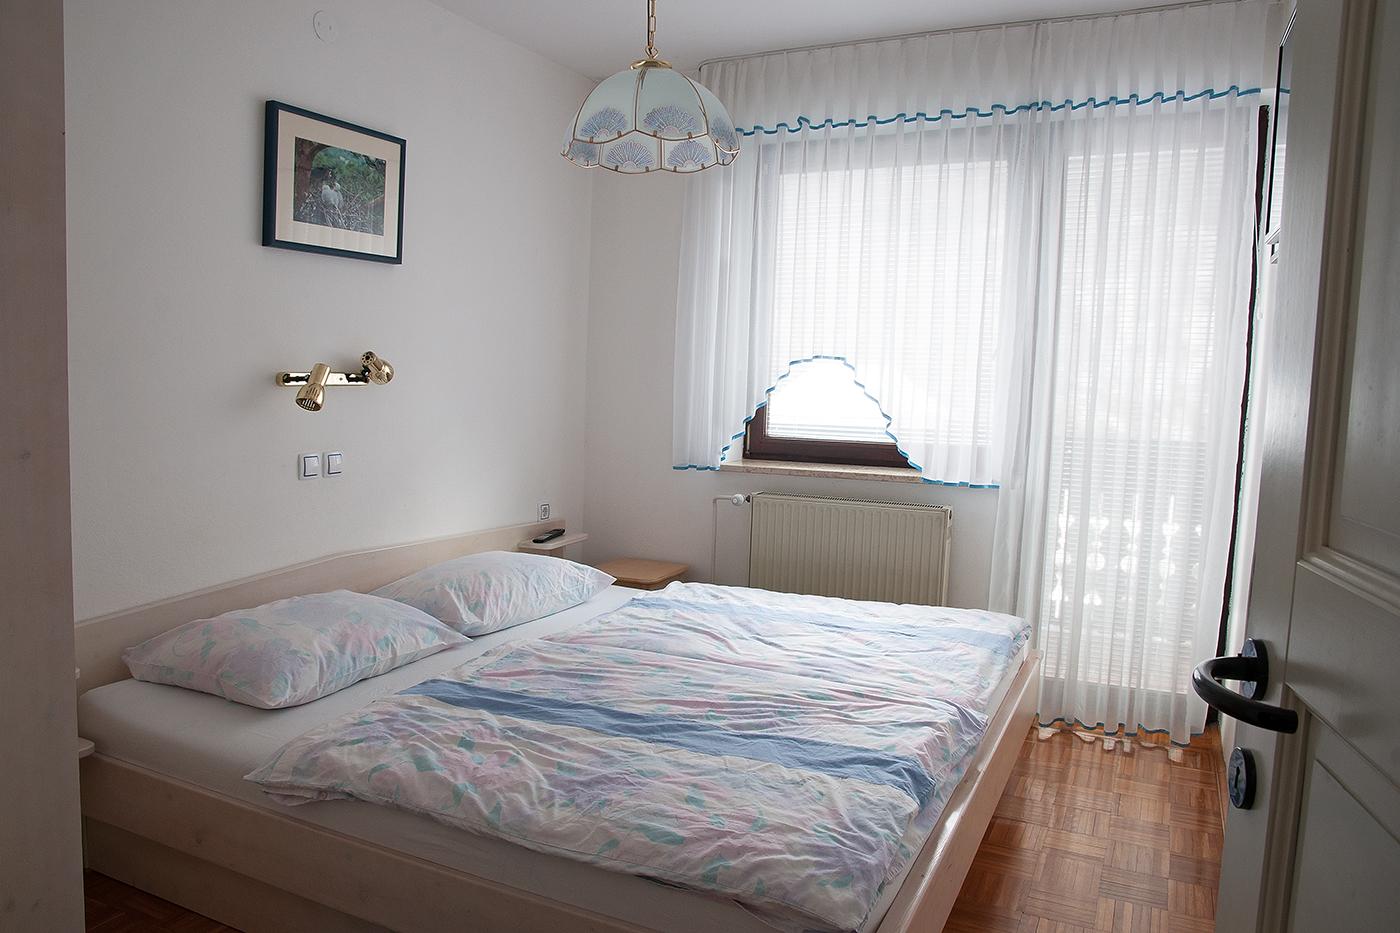 stara_fuzina_apartmanok-2agyas-haloszoba